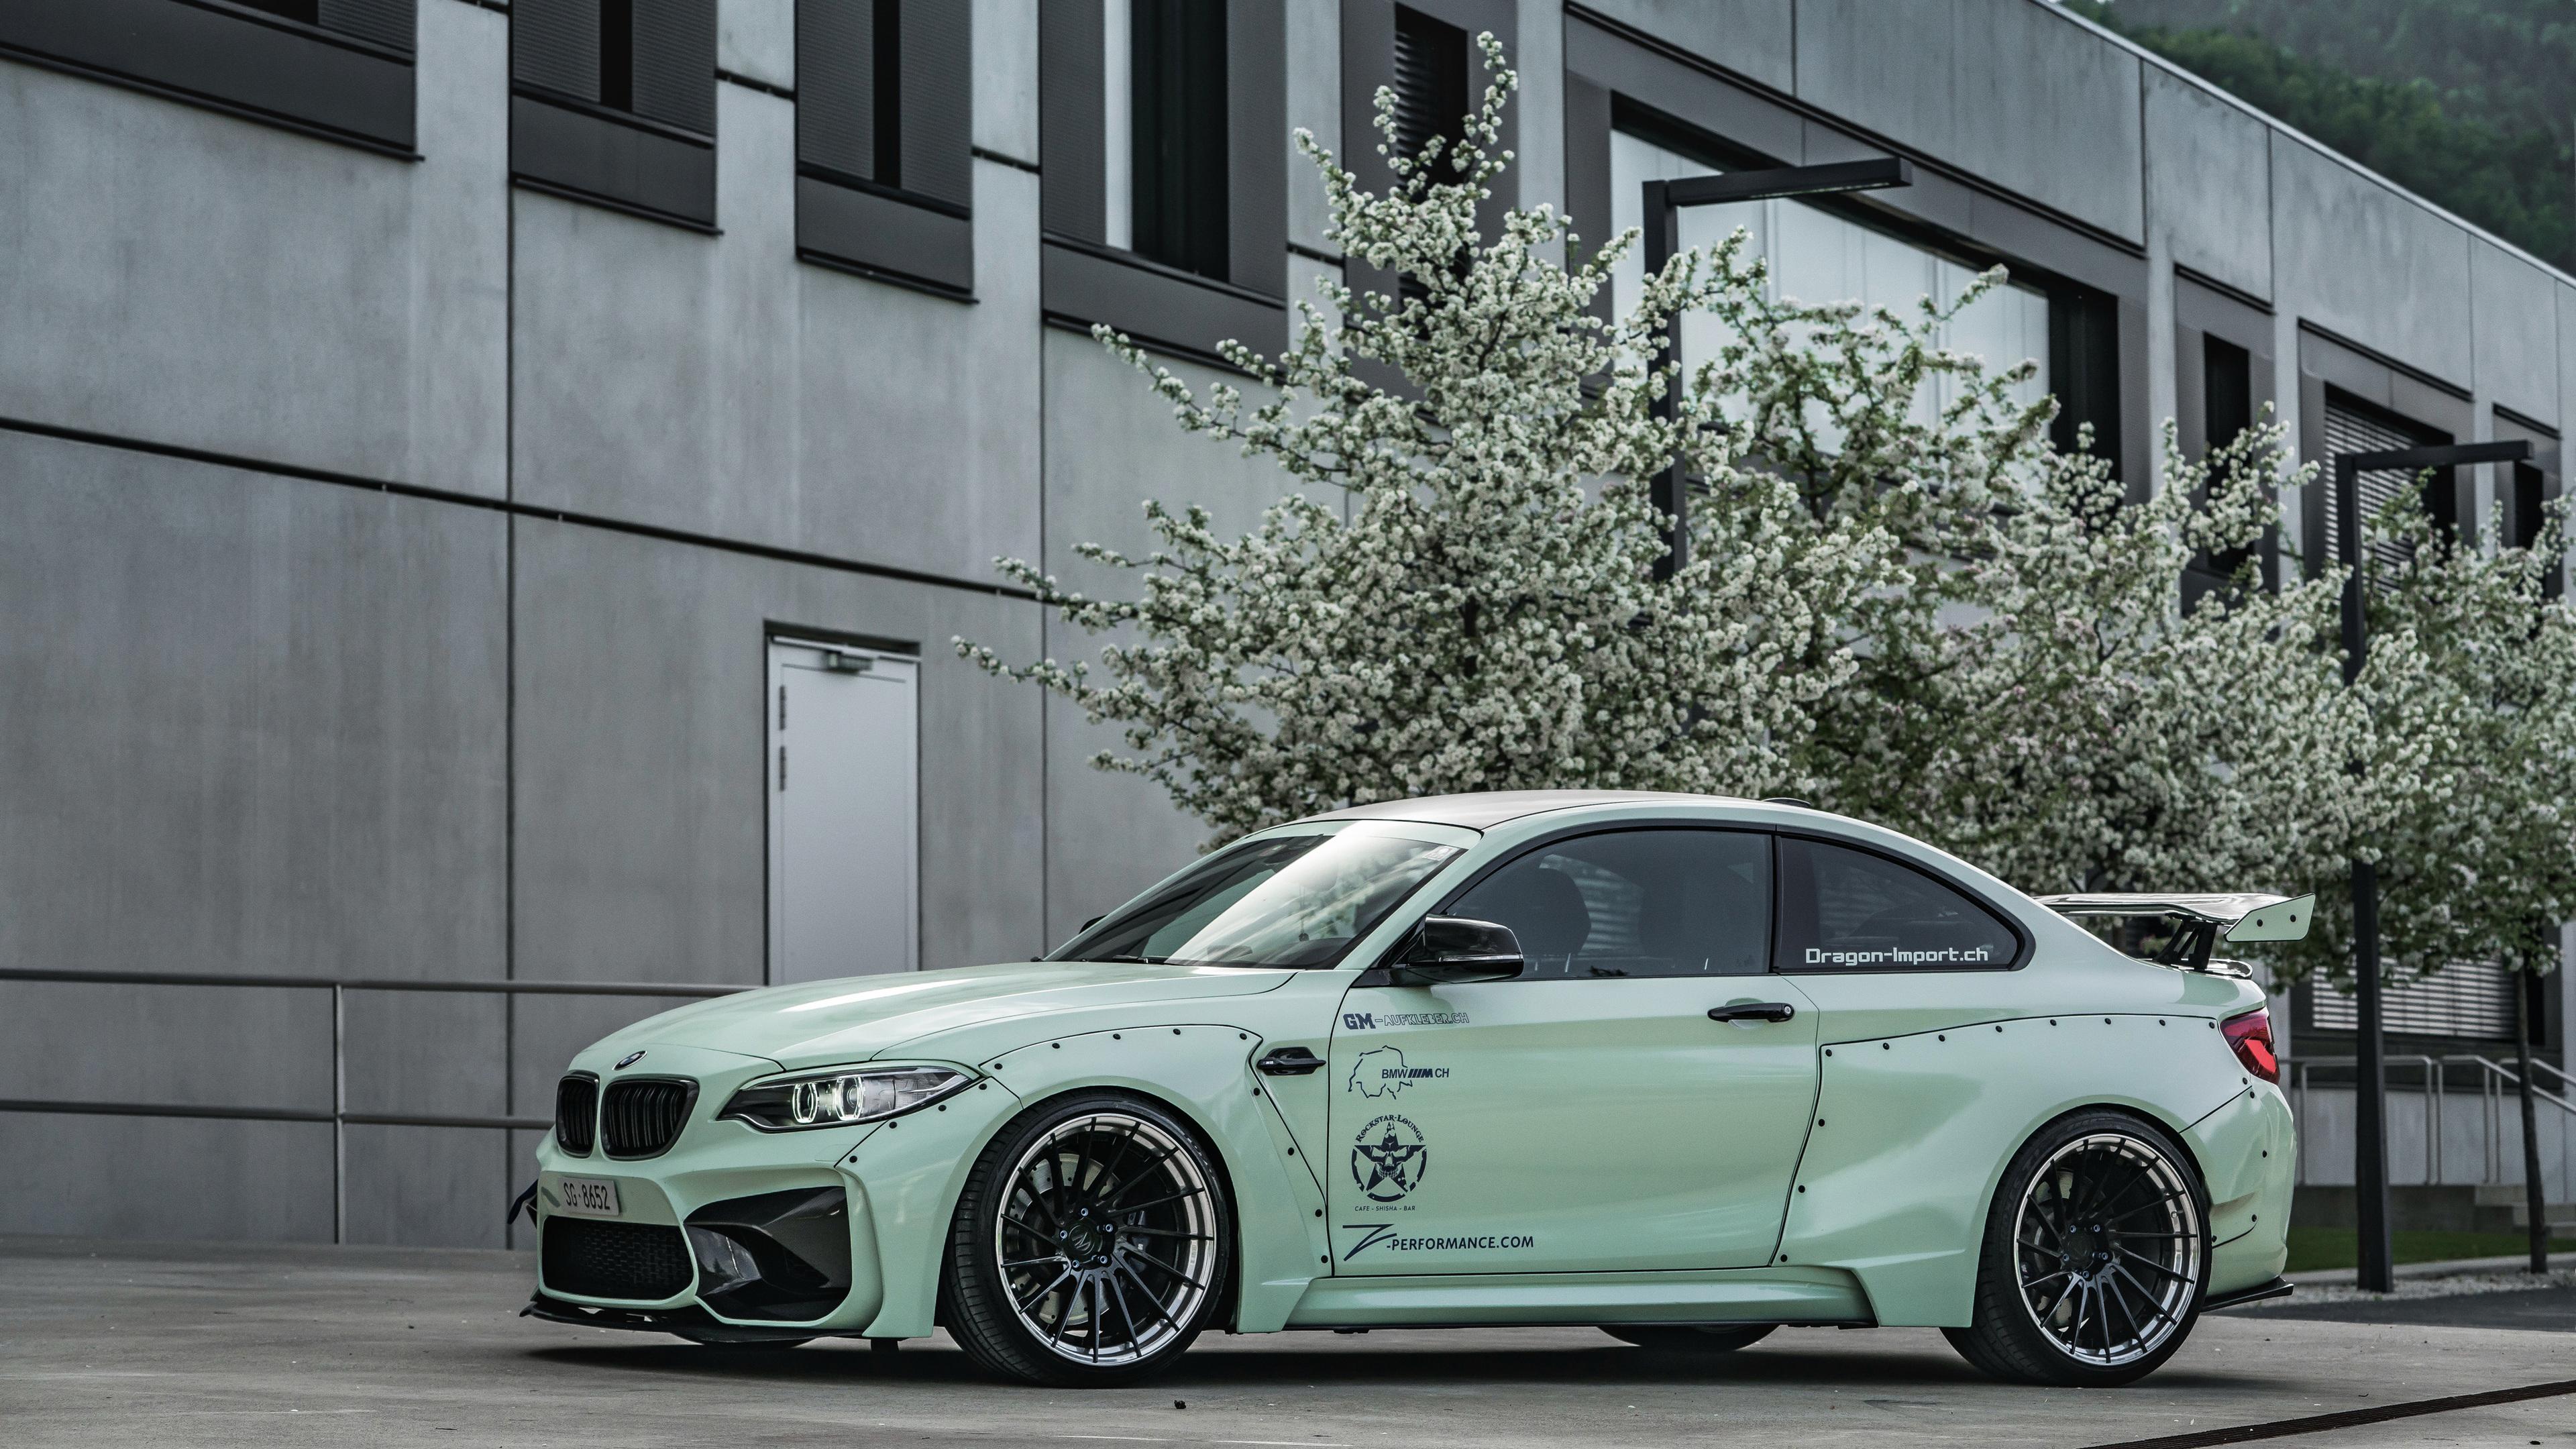 z performance bmw m2 2018 4k 1539111584 - Z Performance BMW M2 2018 4k - hd-wallpapers, cars wallpapers, bmw wallpapers, bmw m2 wallpapers, 4k-wallpapers, 2018 cars wallpapers